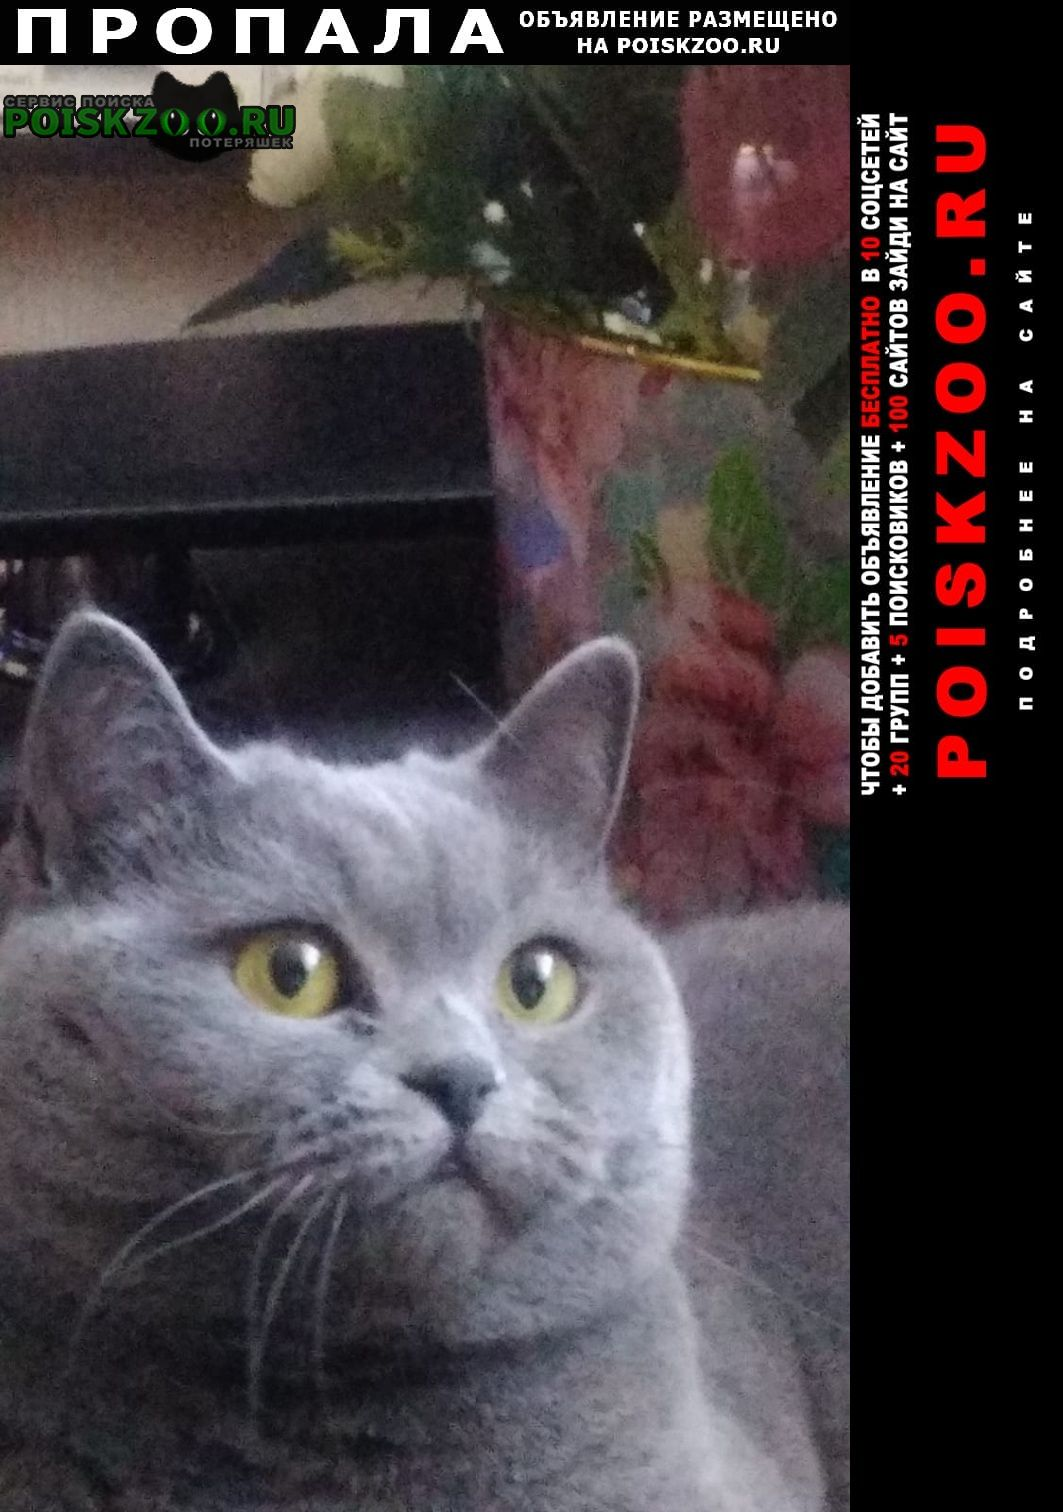 Пропала кошка sos, помогите найти г.Витебск